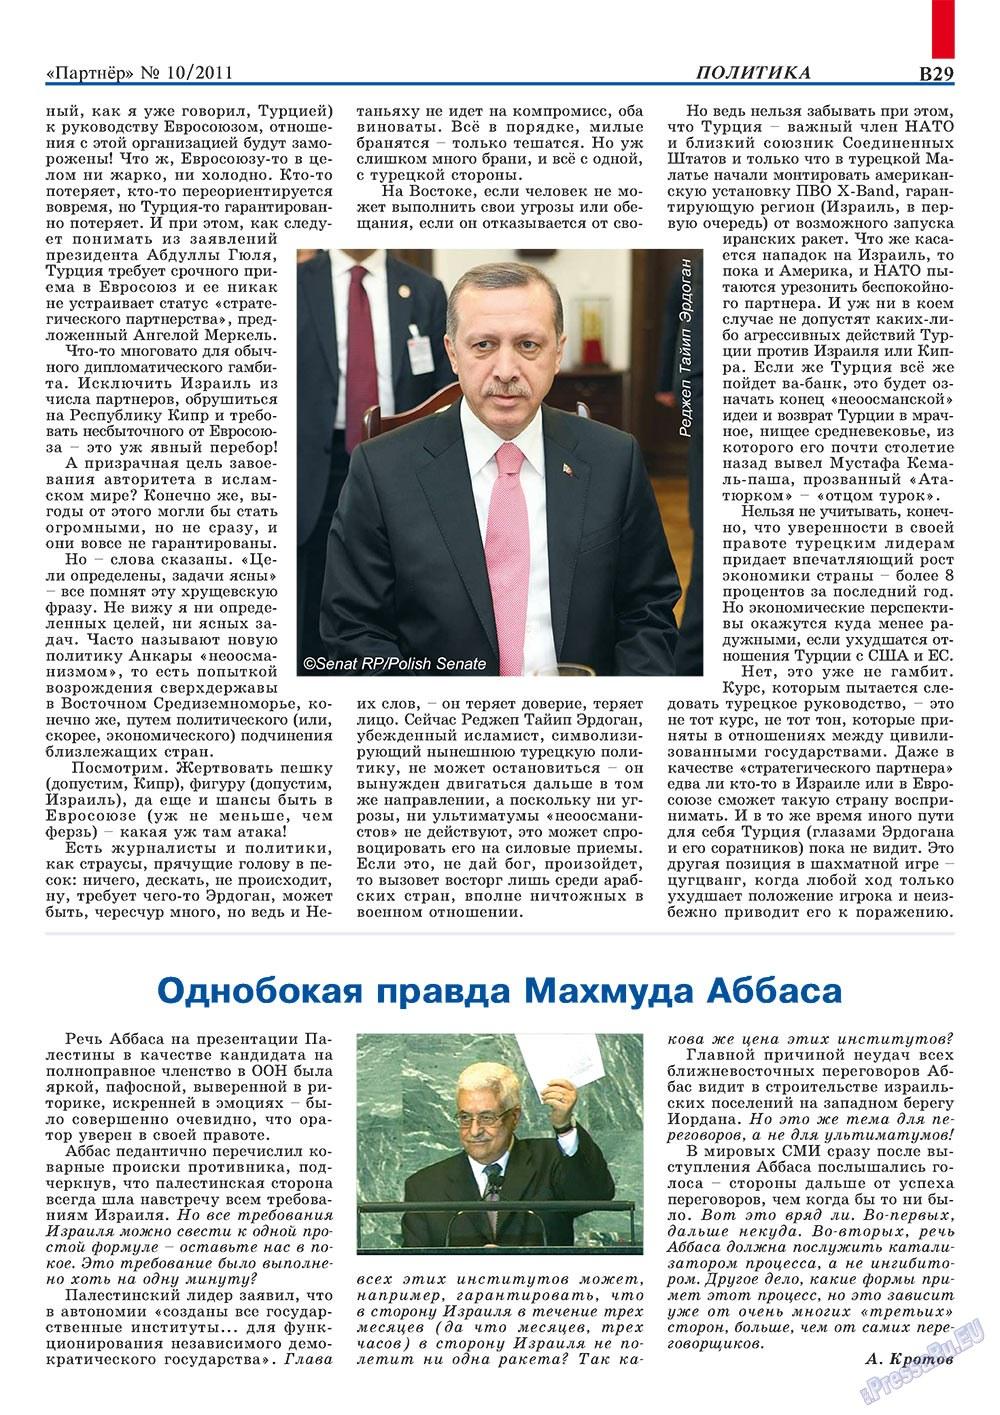 Партнер-север (журнал). 2011 год, номер 10, стр. 39